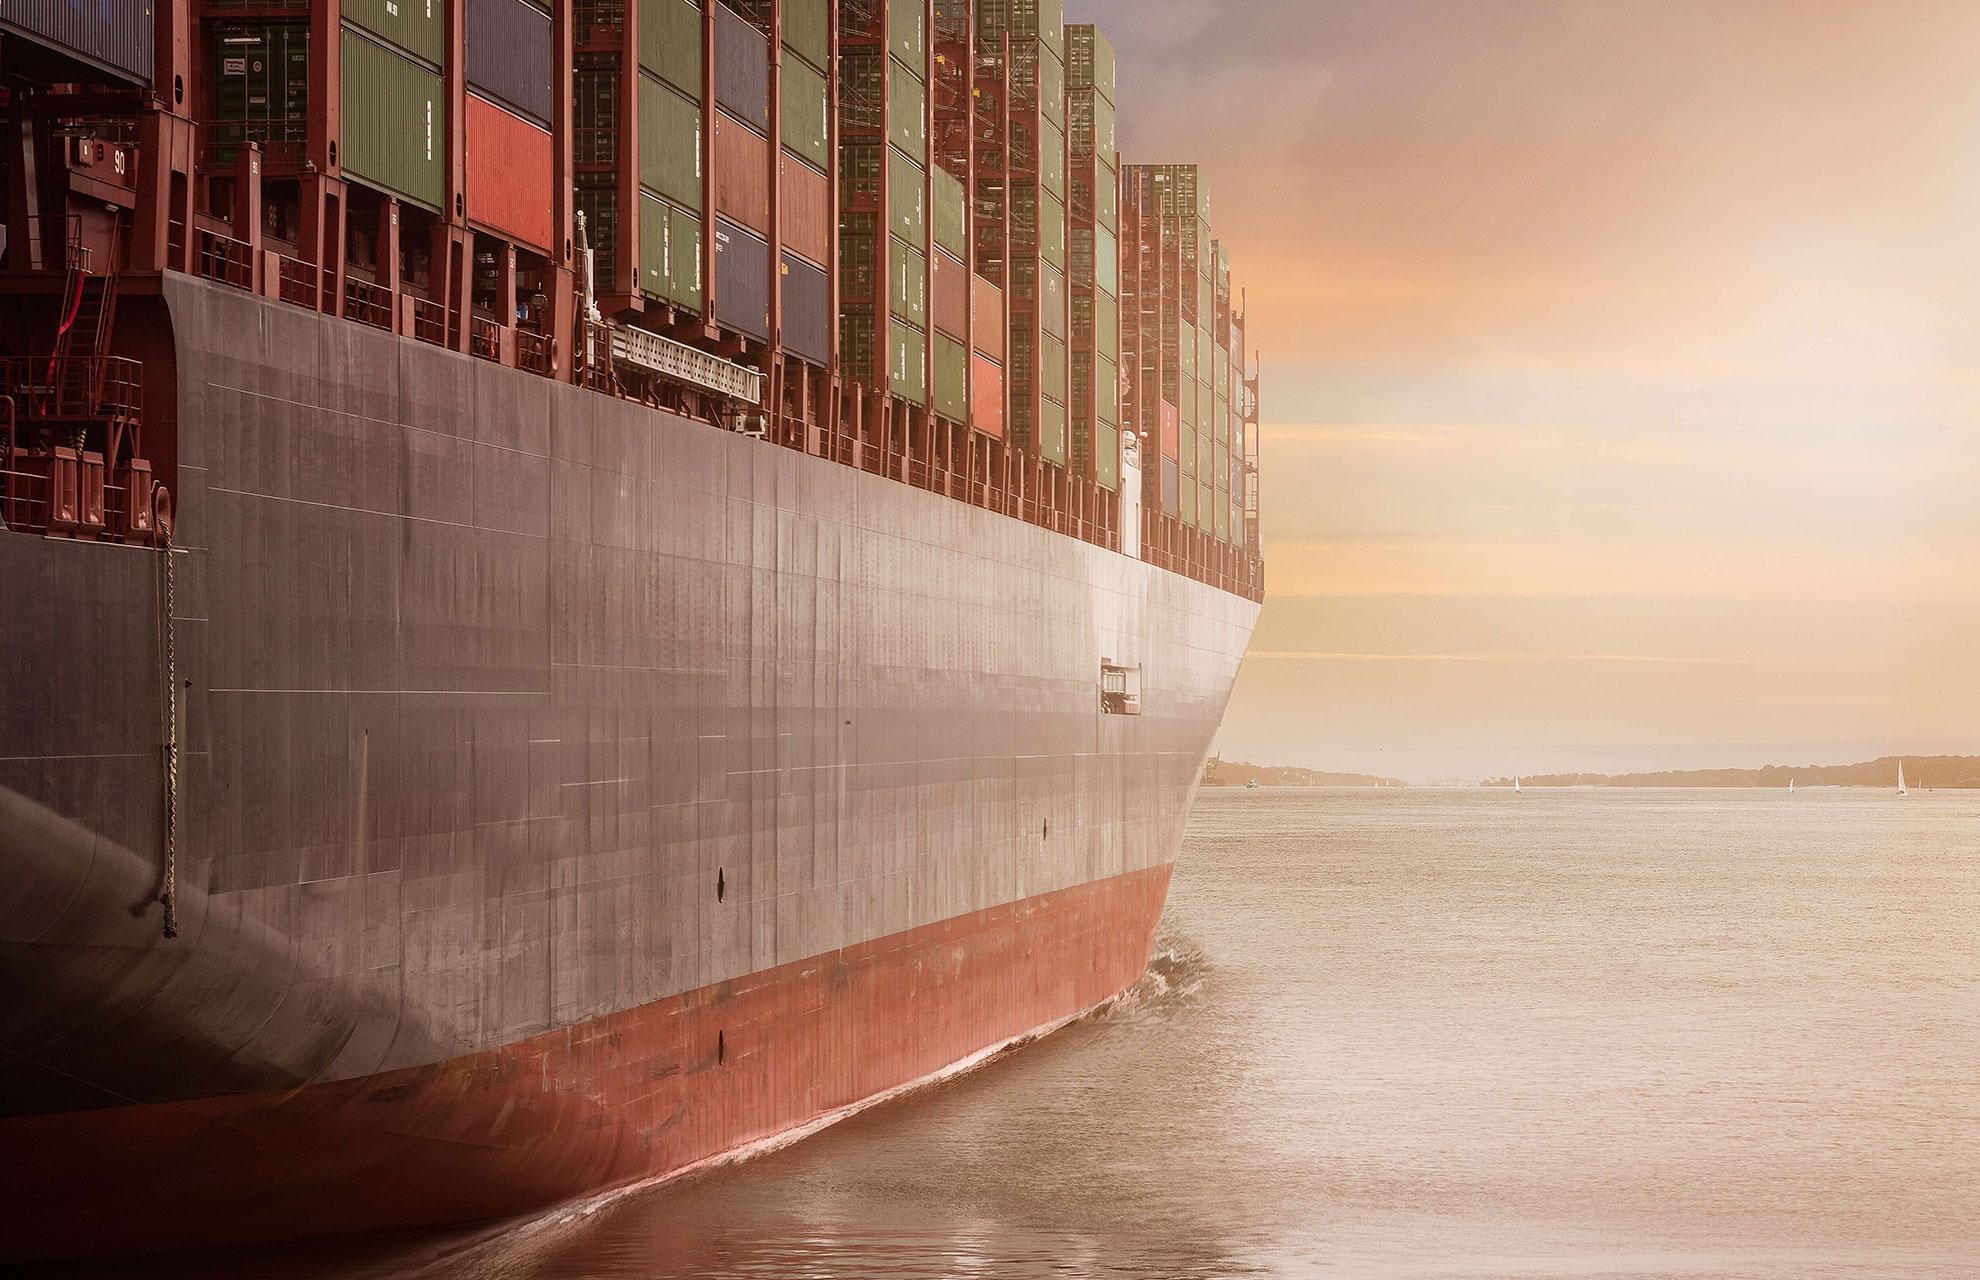 Cargo Container Background Blog